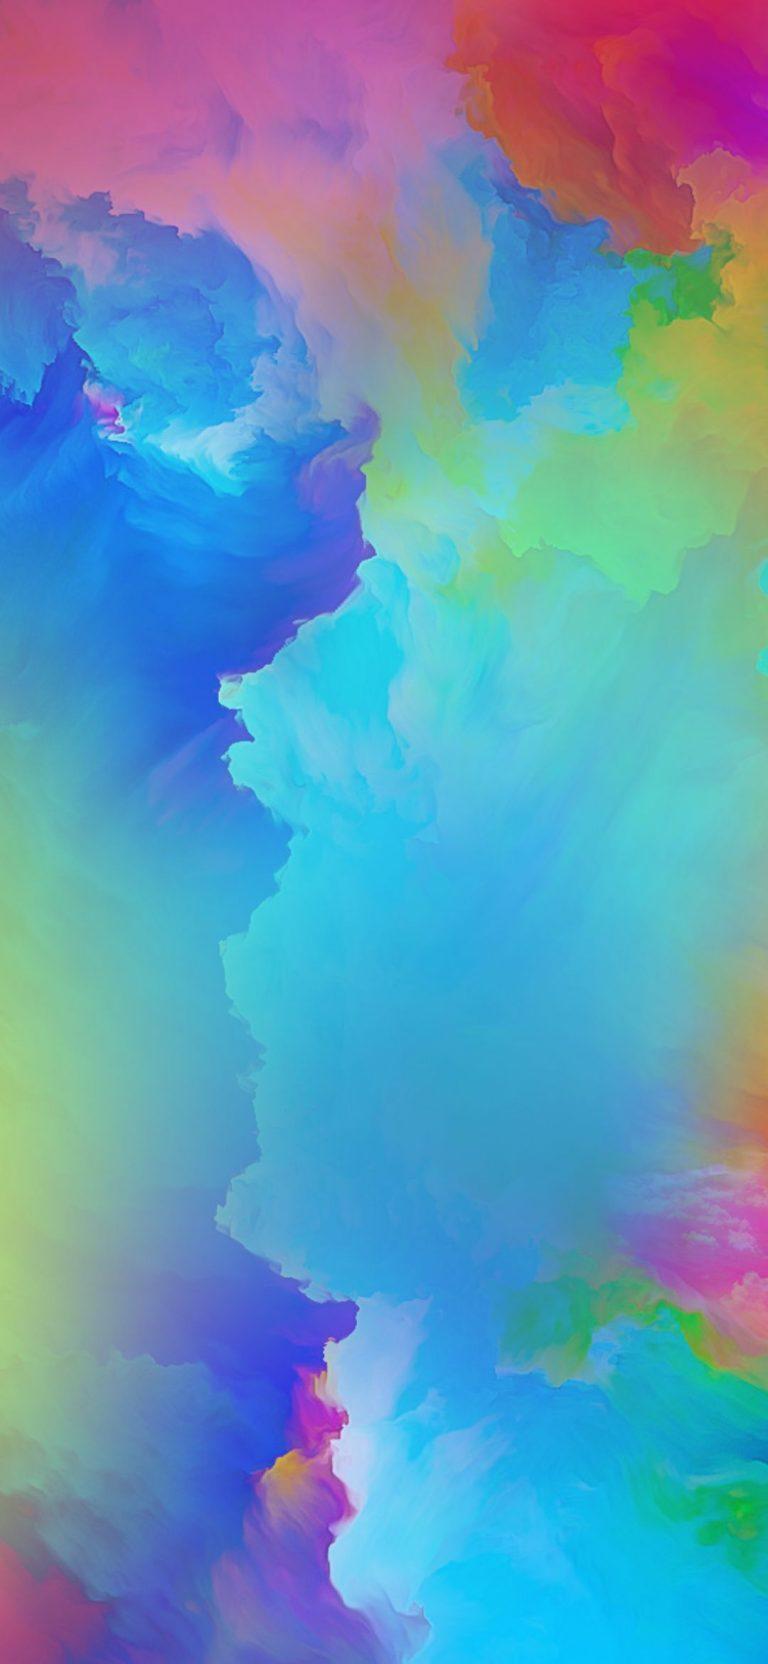 Samsung Galaxy M40 Stock Wallpaper 05 1080x2340 768x1664